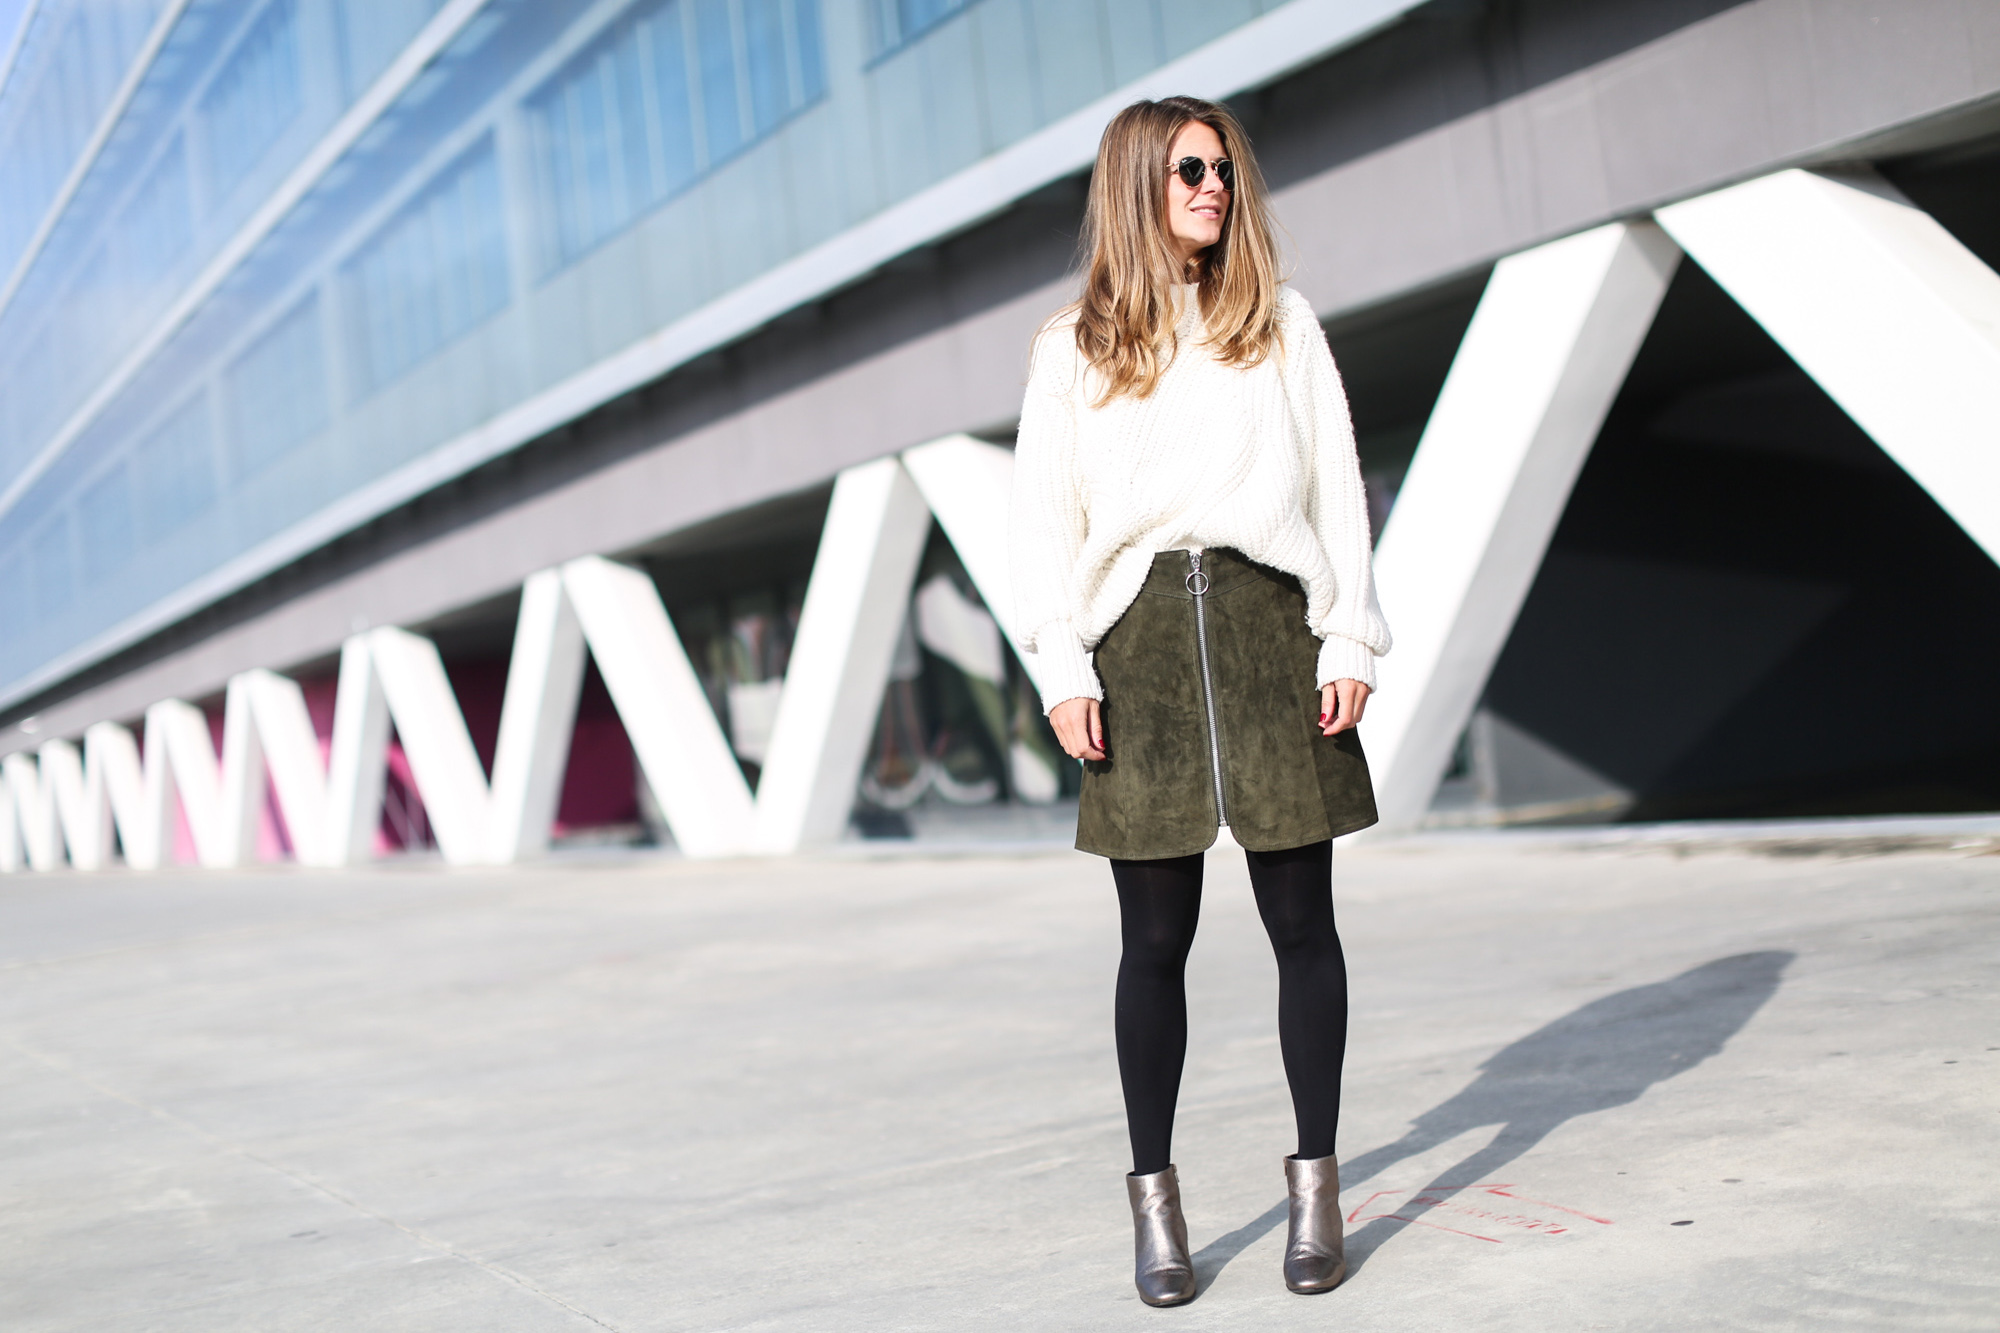 Clochet_streetstyle_fashionblogger_asosfauxfurcoat_minifaldaantezara_botinespieldorados-6